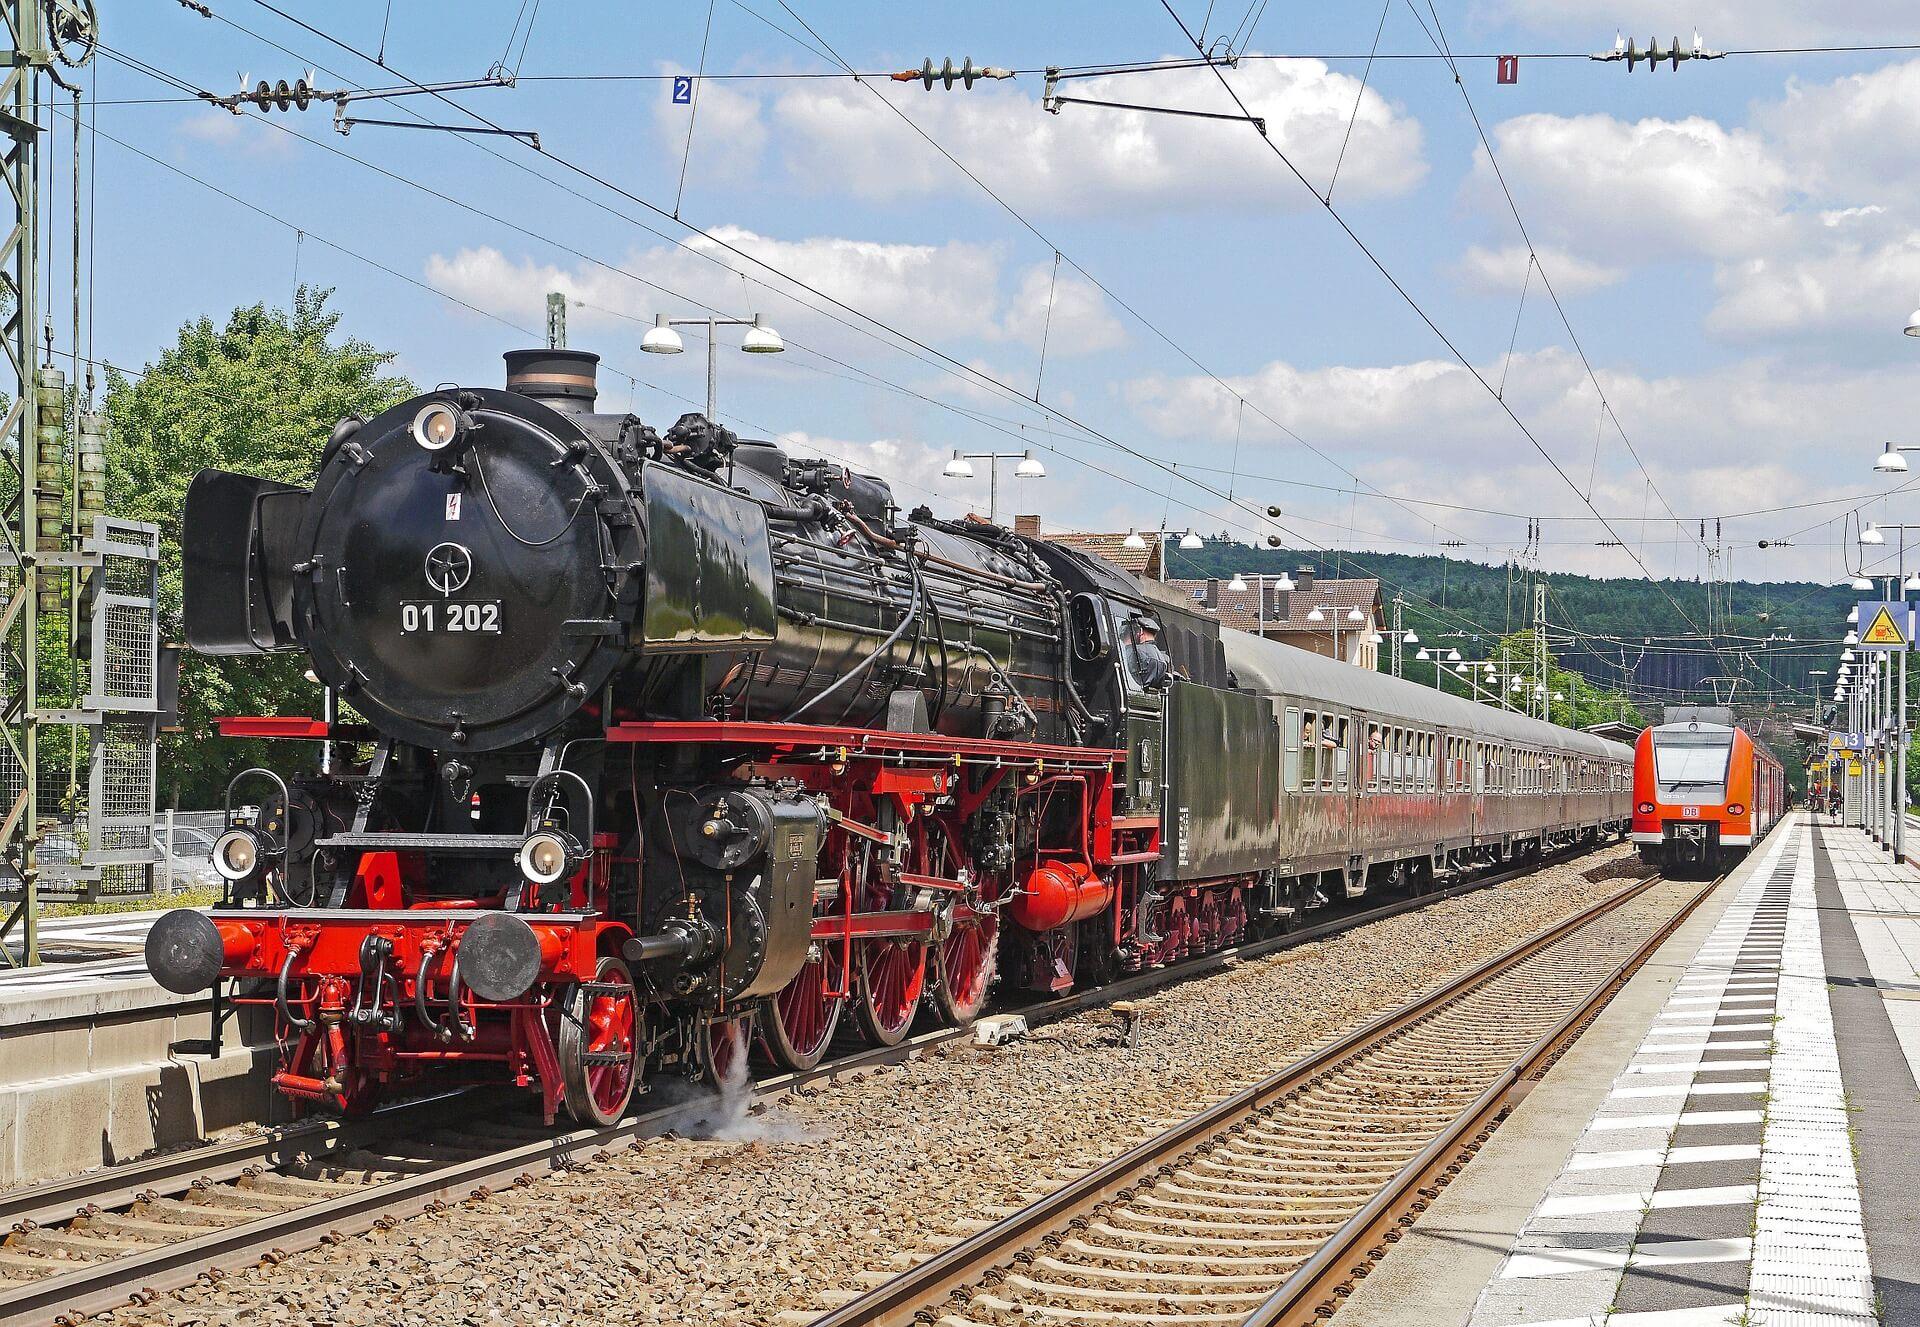 steam-locomotive-1358662_1920